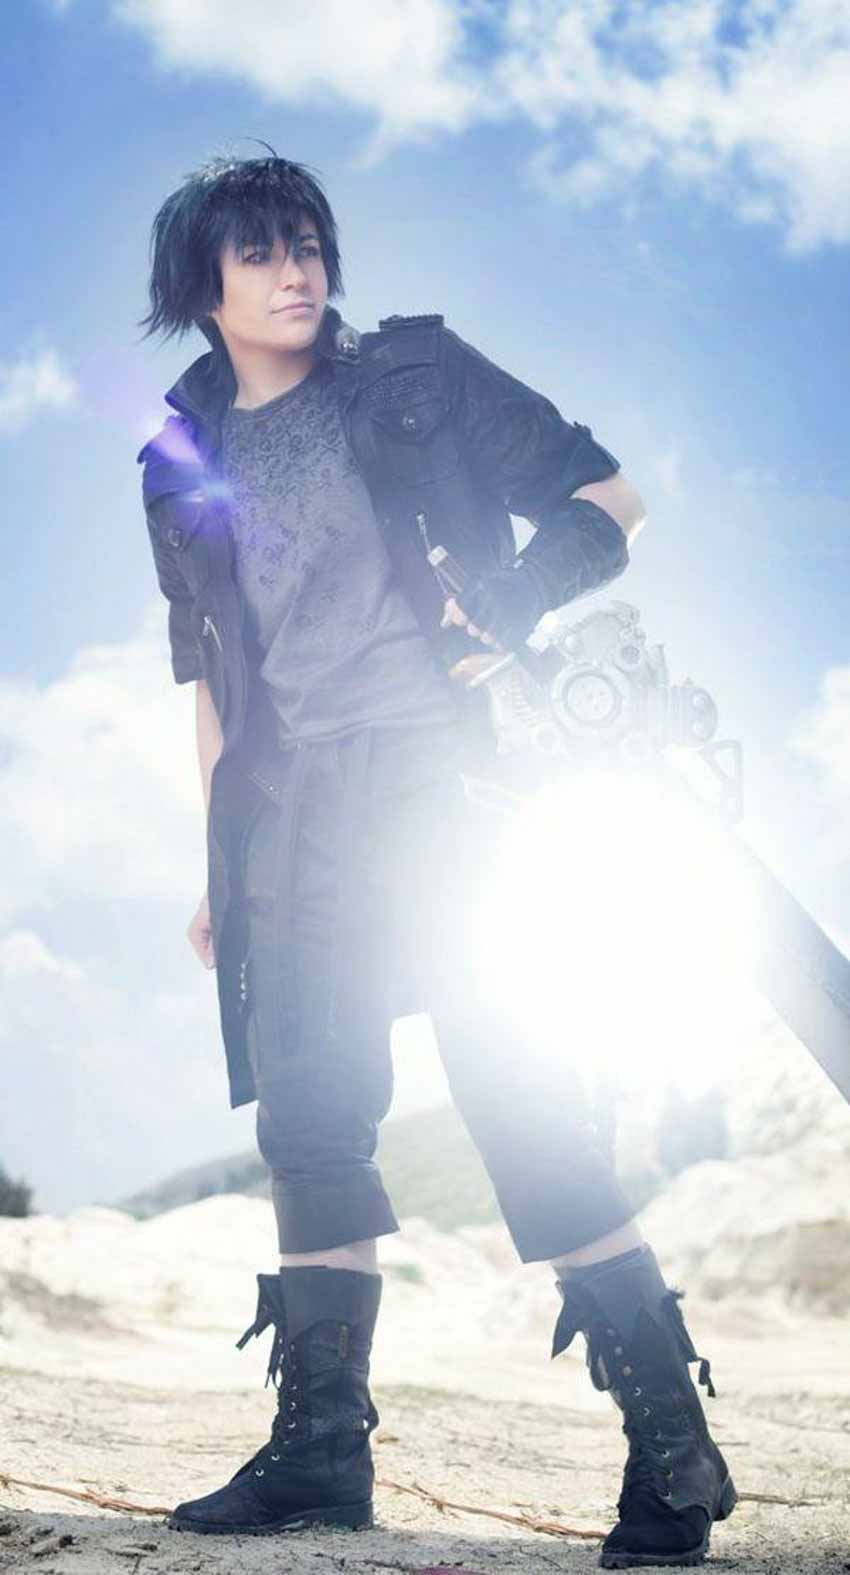 MaouKami Cosplay trong vai nhân vật Noctis Lucis Caelum trong game Final Fantasy XV